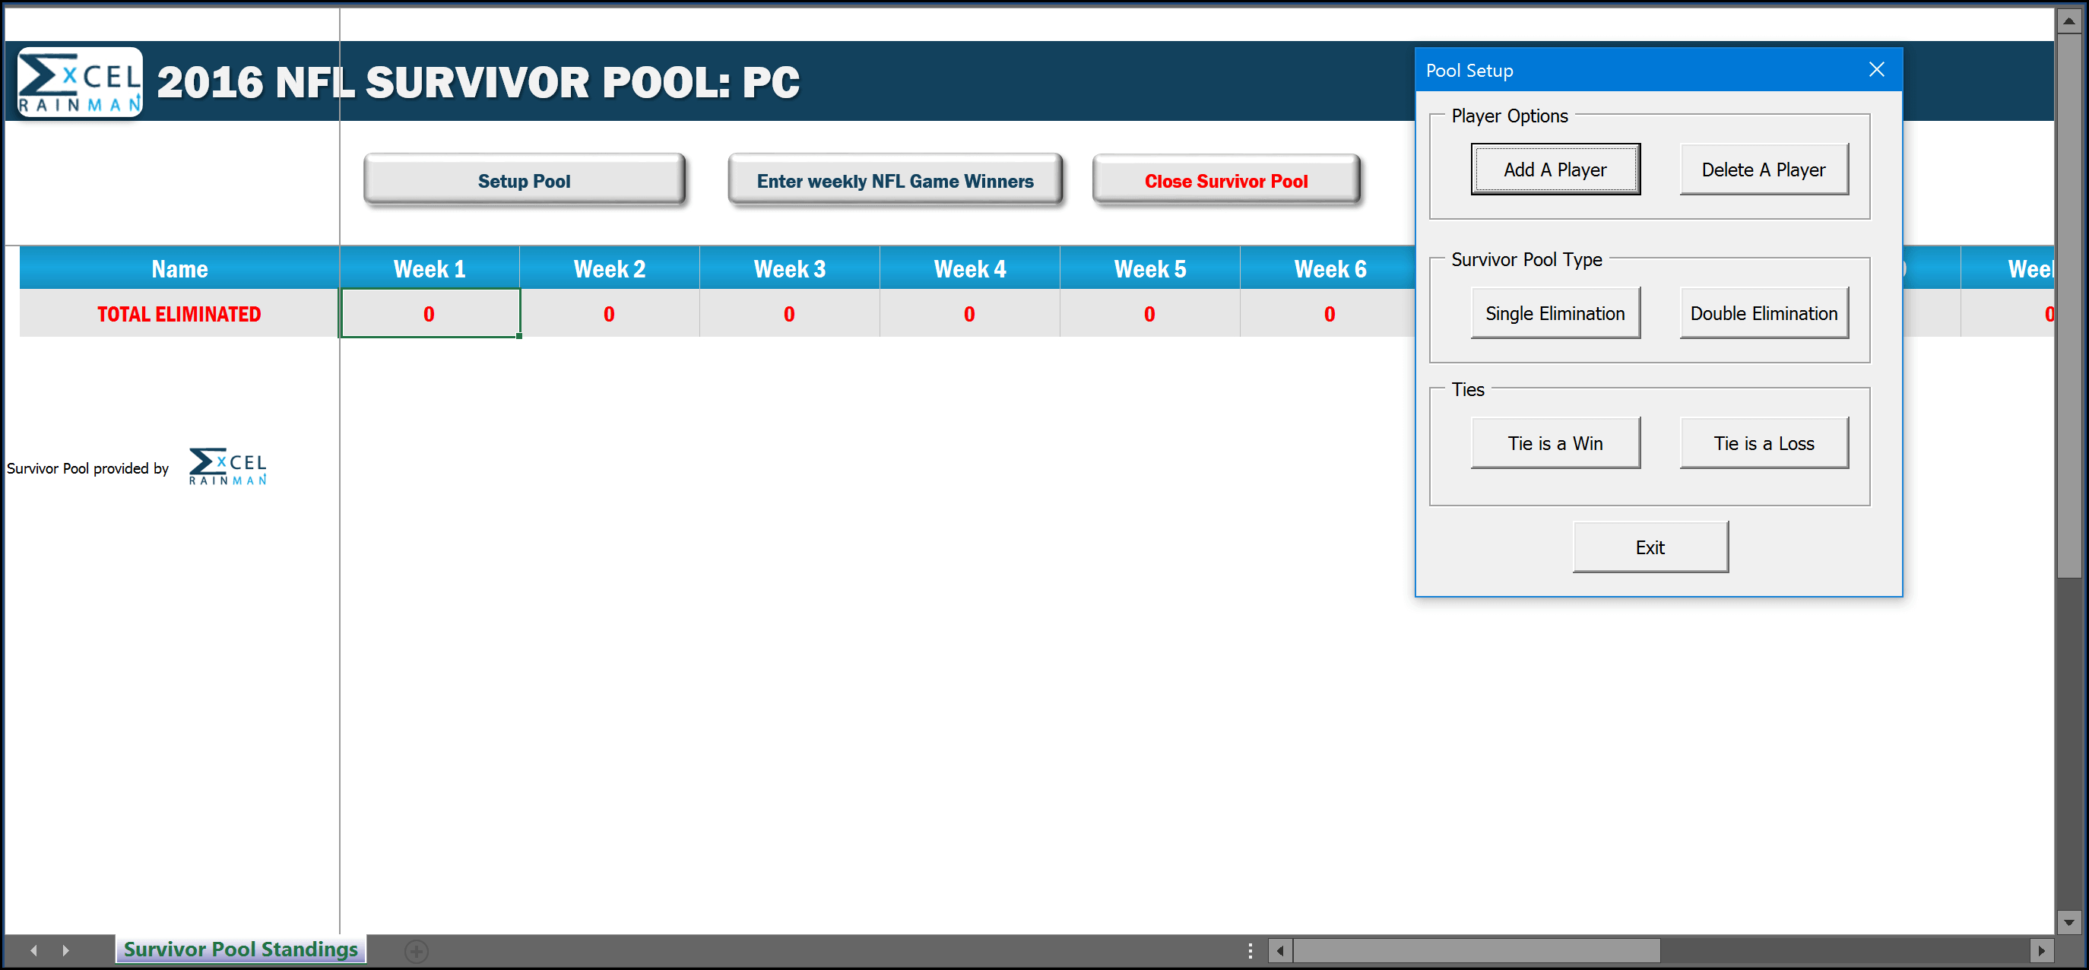 Nfl Suicide Pool Spreadsheet Pertaining To Spreadsheet Survivor Pool 2016  Erm